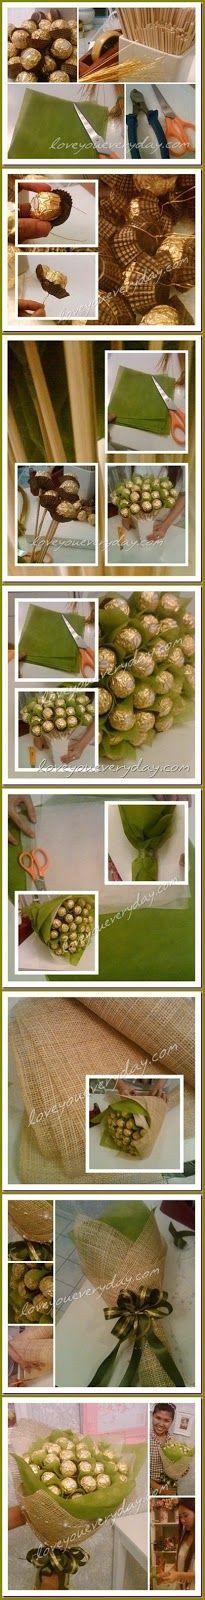 Chocolate Flower Bouquet - Ferrero Rocher